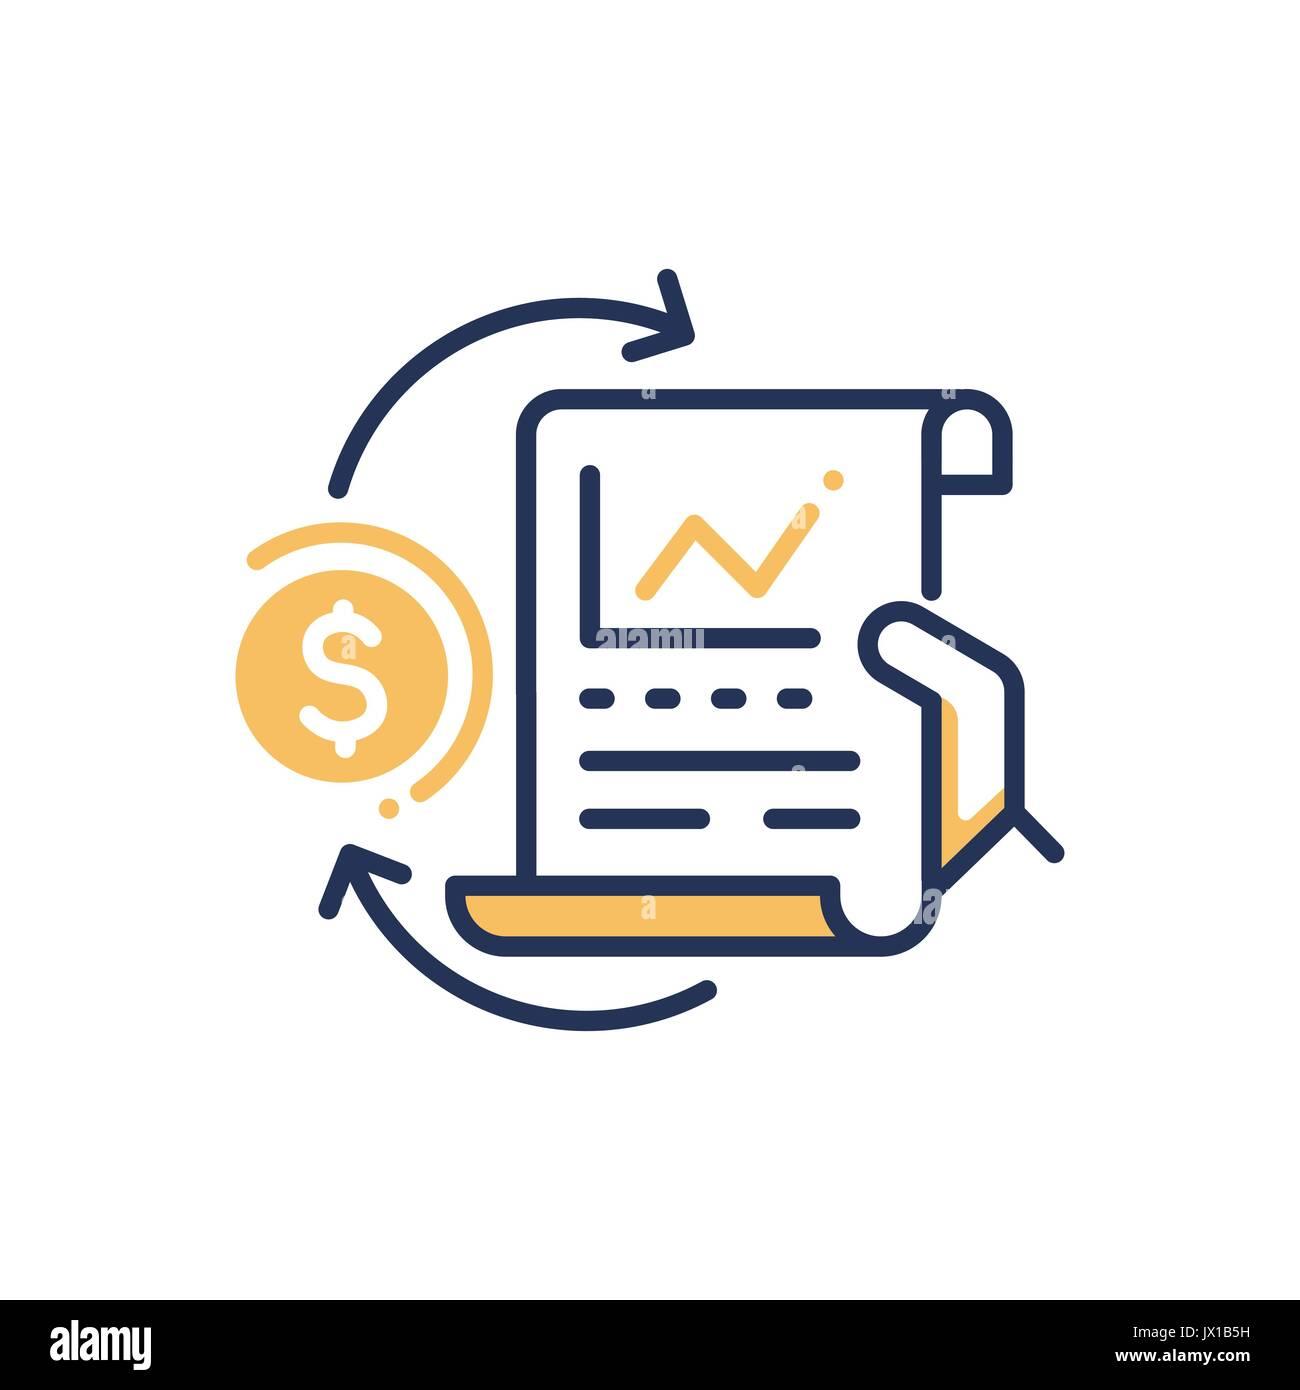 Stock Exchange Modern Vector Line Design Icon Stock Vector Art